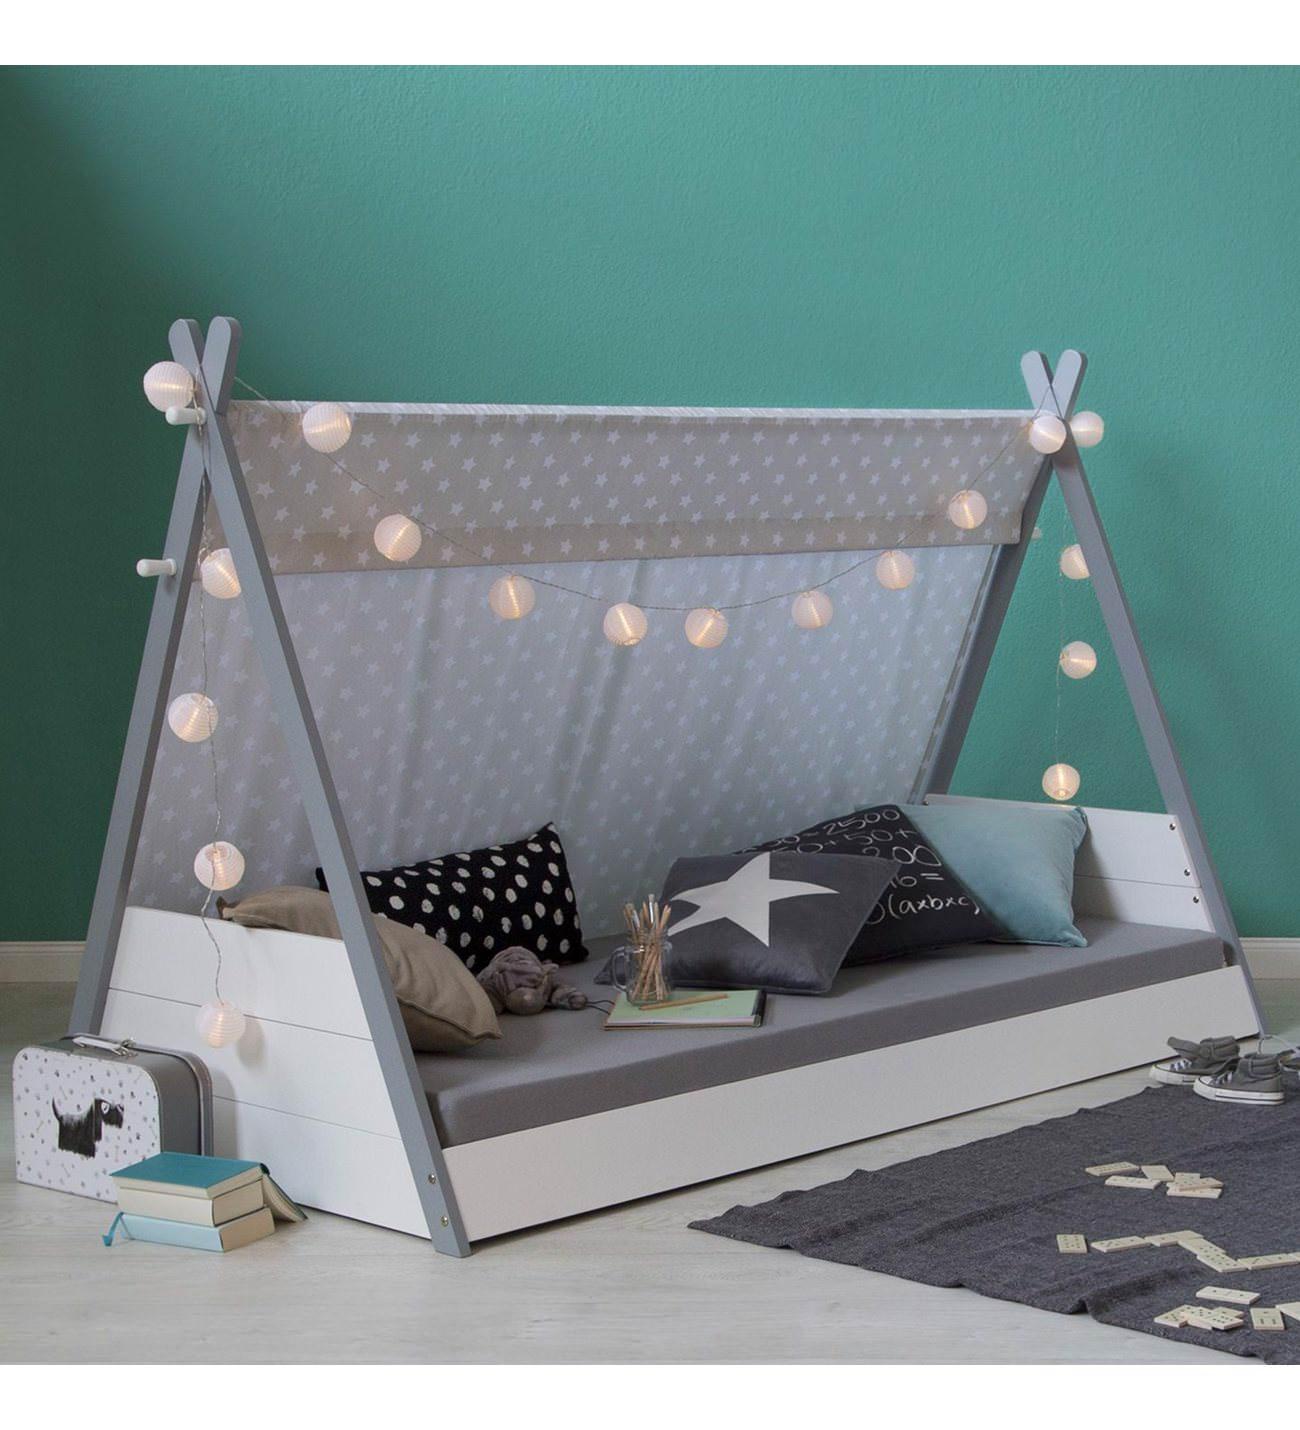 نور پردازی تخت کودک